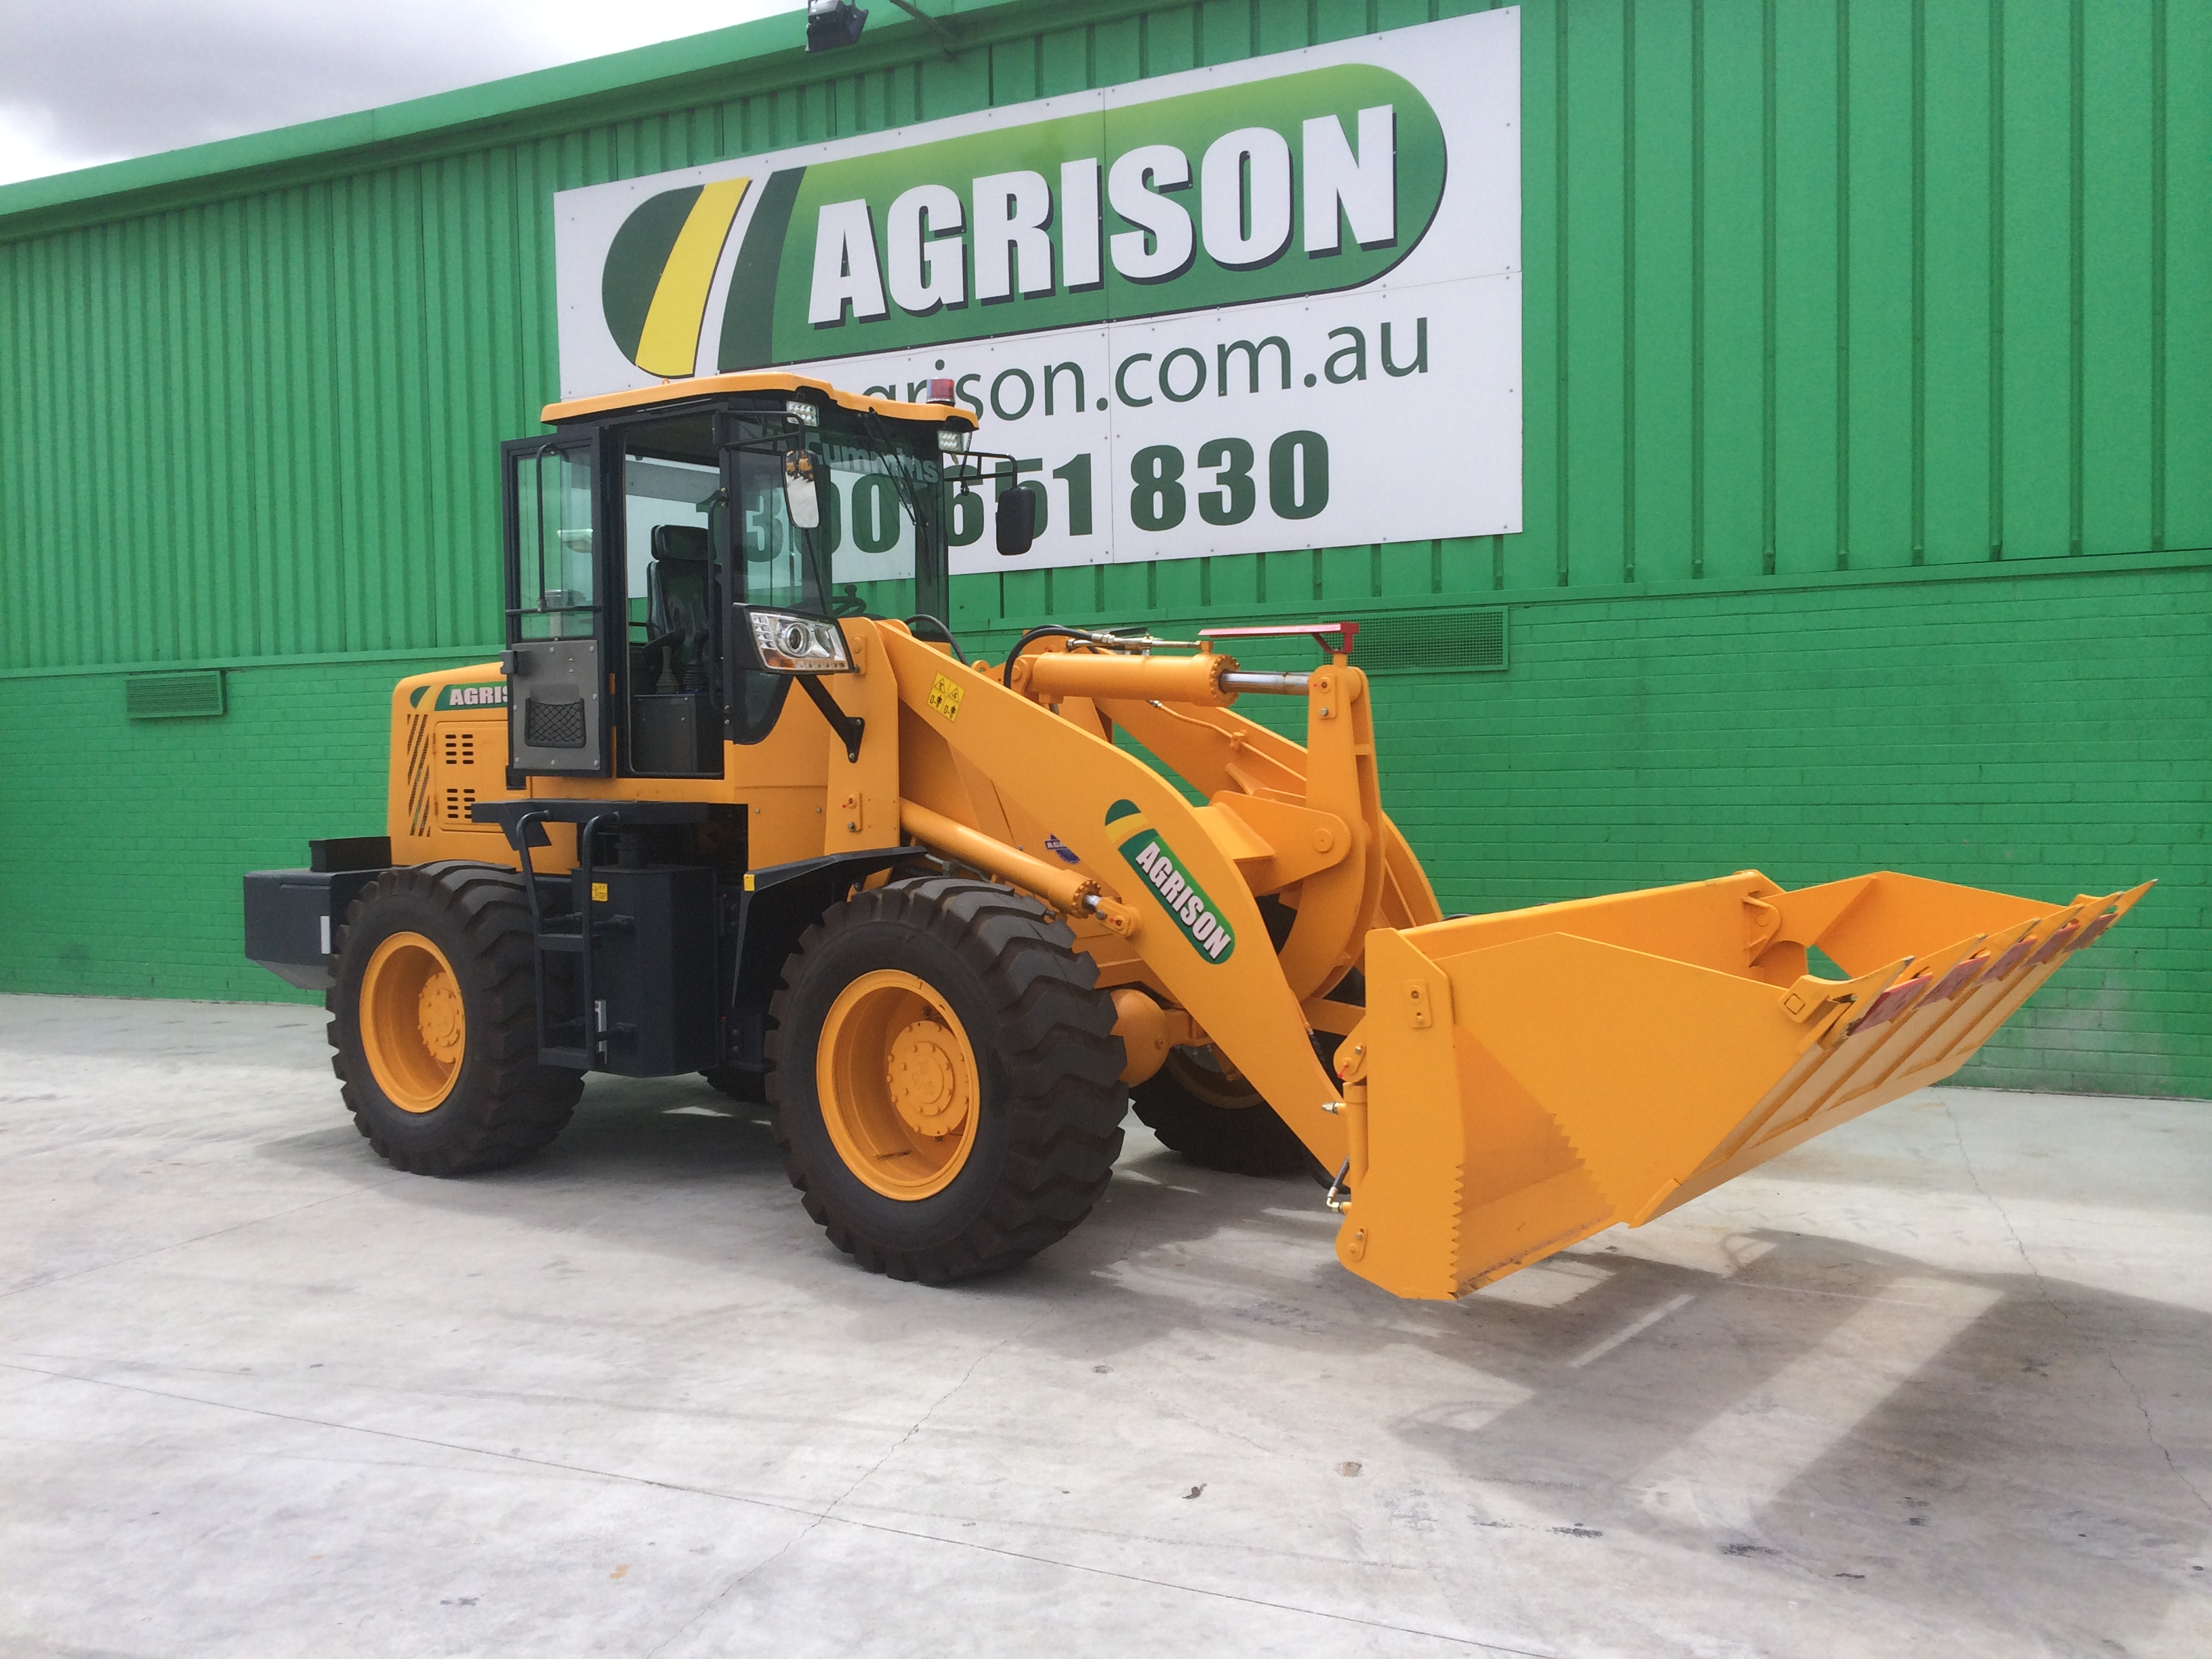 macchine agricole agrison australia TX932-Agrison-Wheel-Loader-1